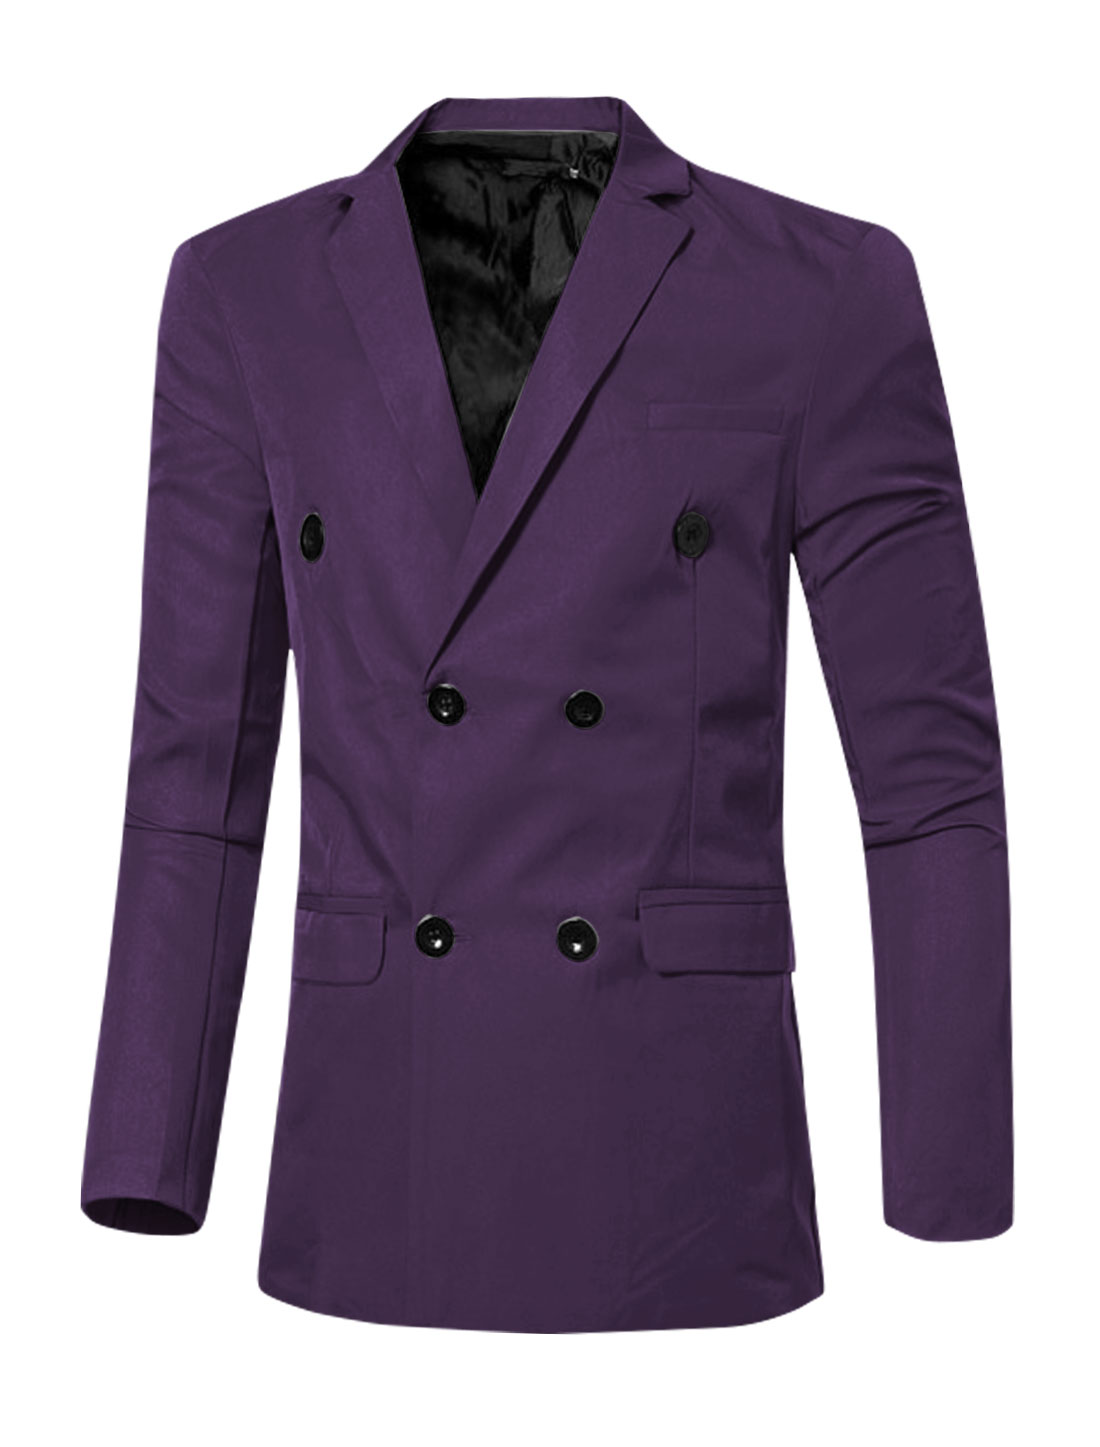 Men Notched Lapel Flap Pockets Double Breasted Blazer Purple S